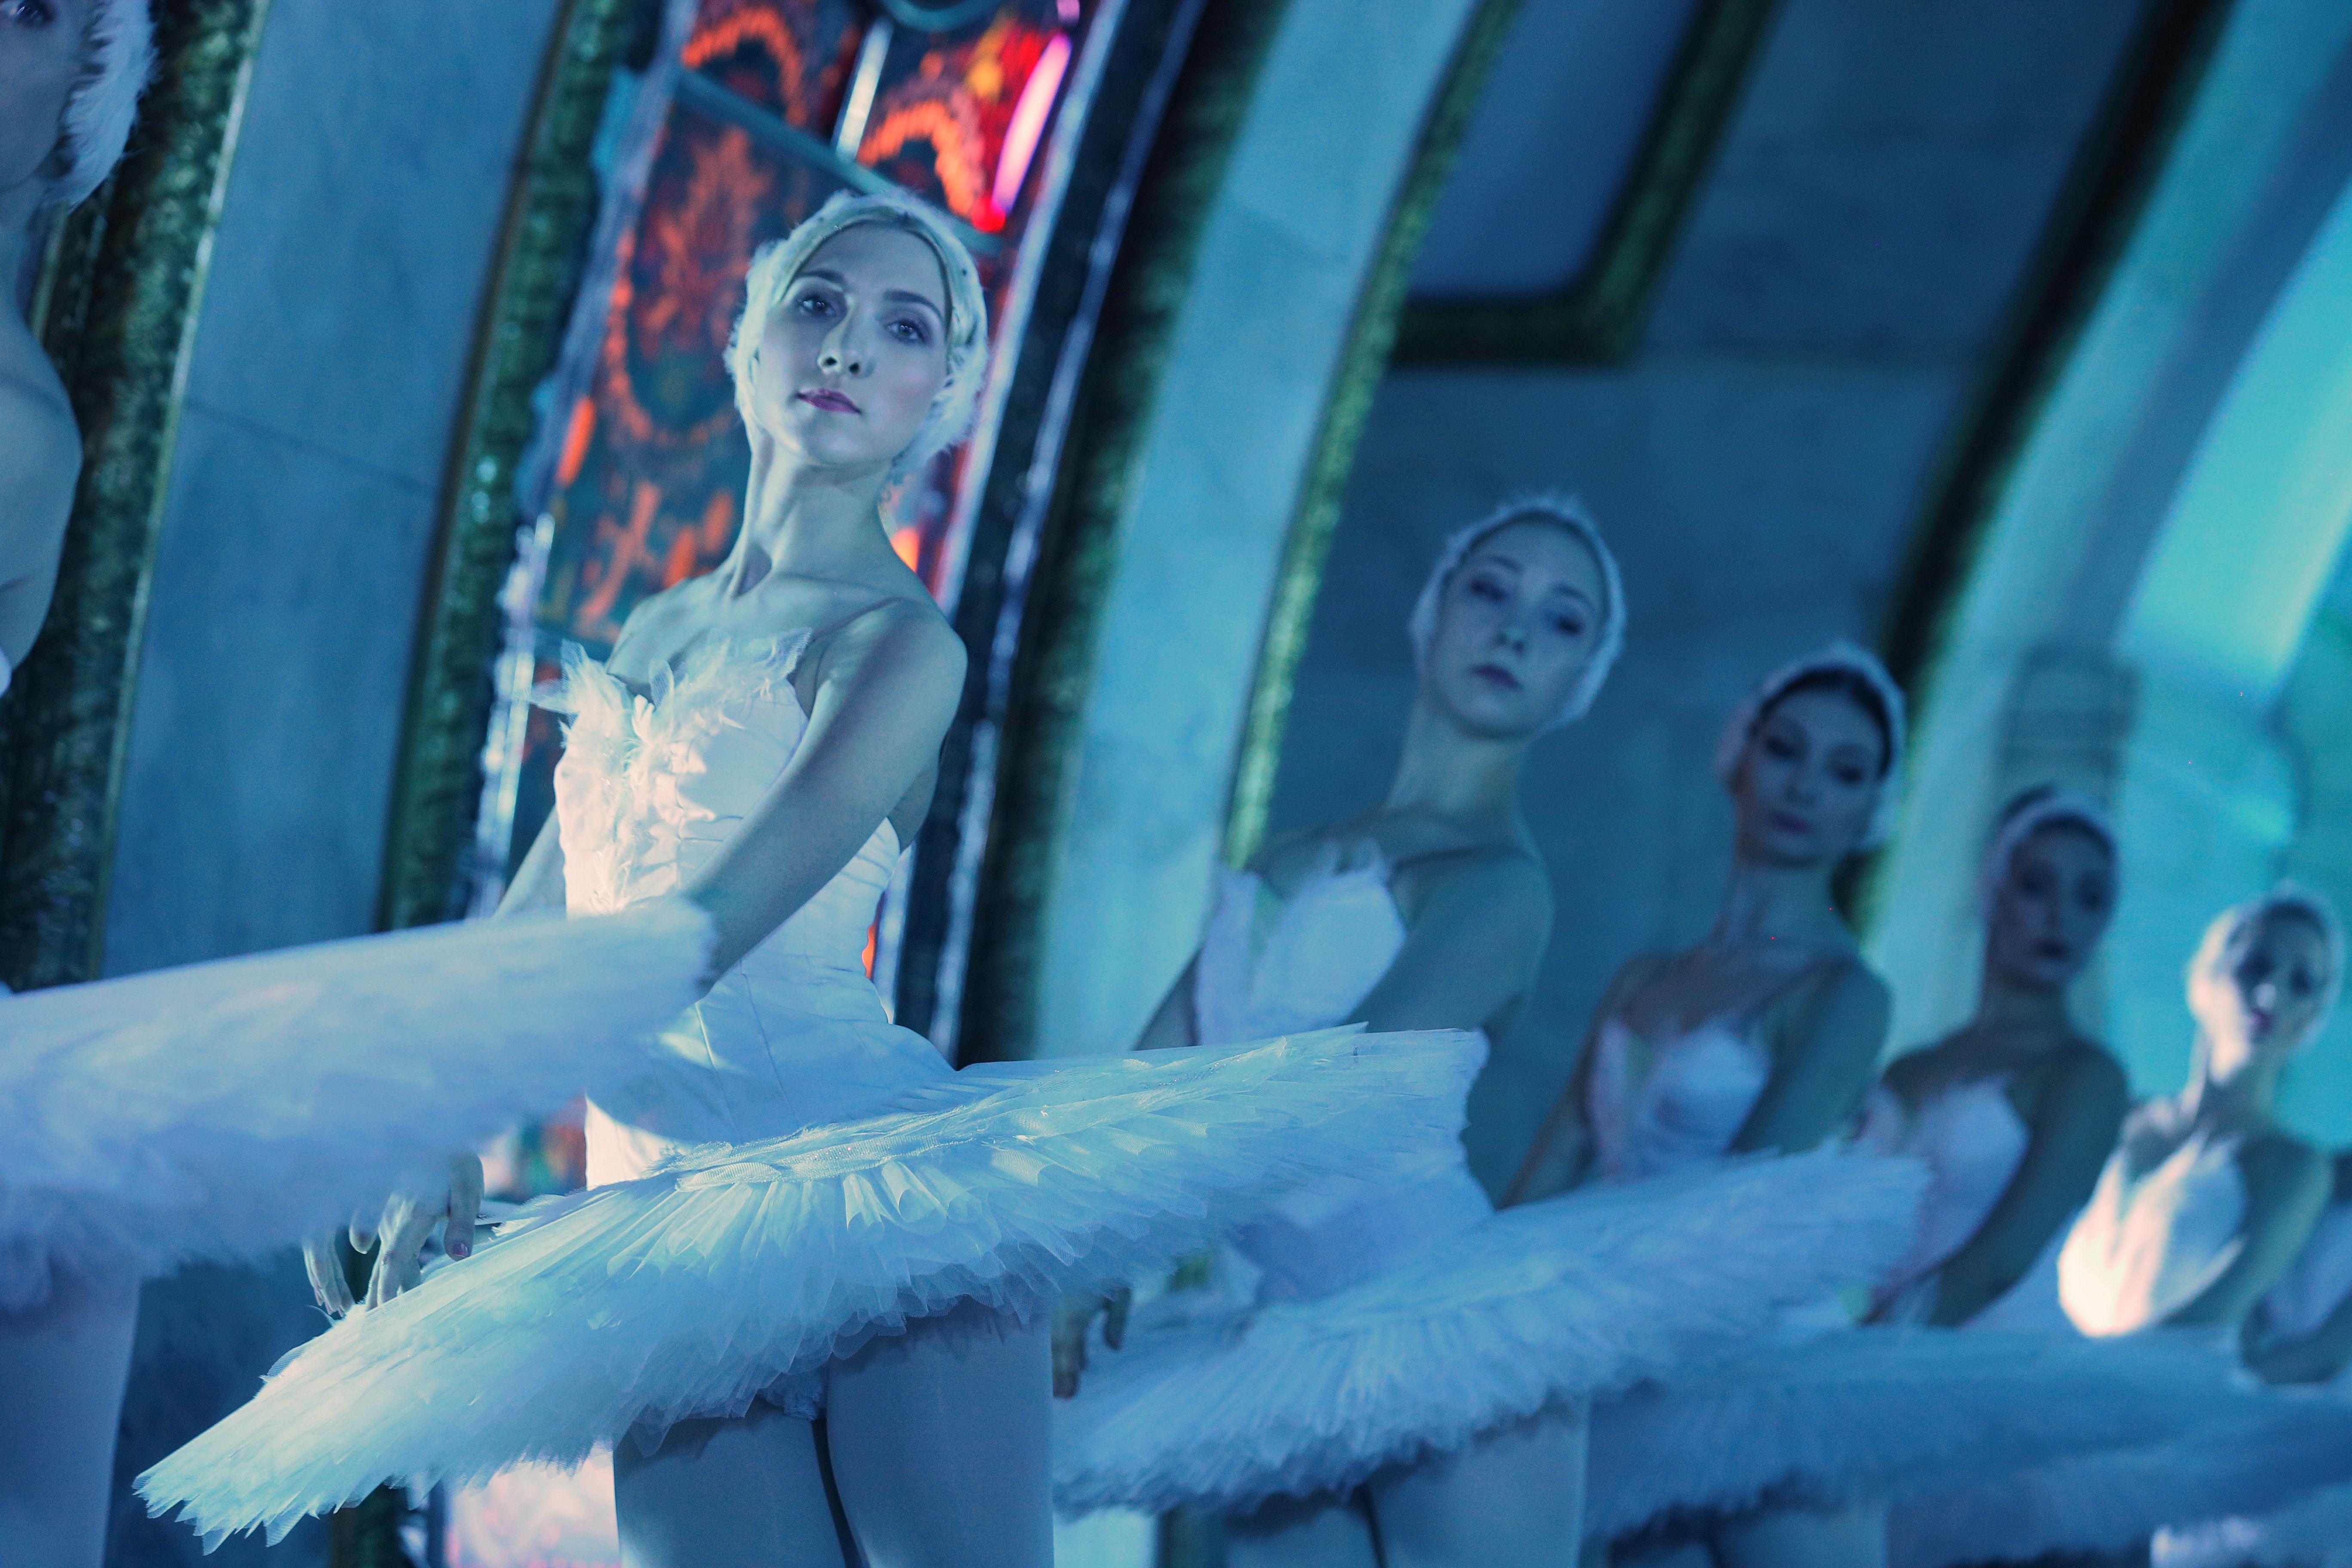 Особенности балета обсудят в Минвнешторге. Фото: Антон Гердо, «Вечерняя Москва»